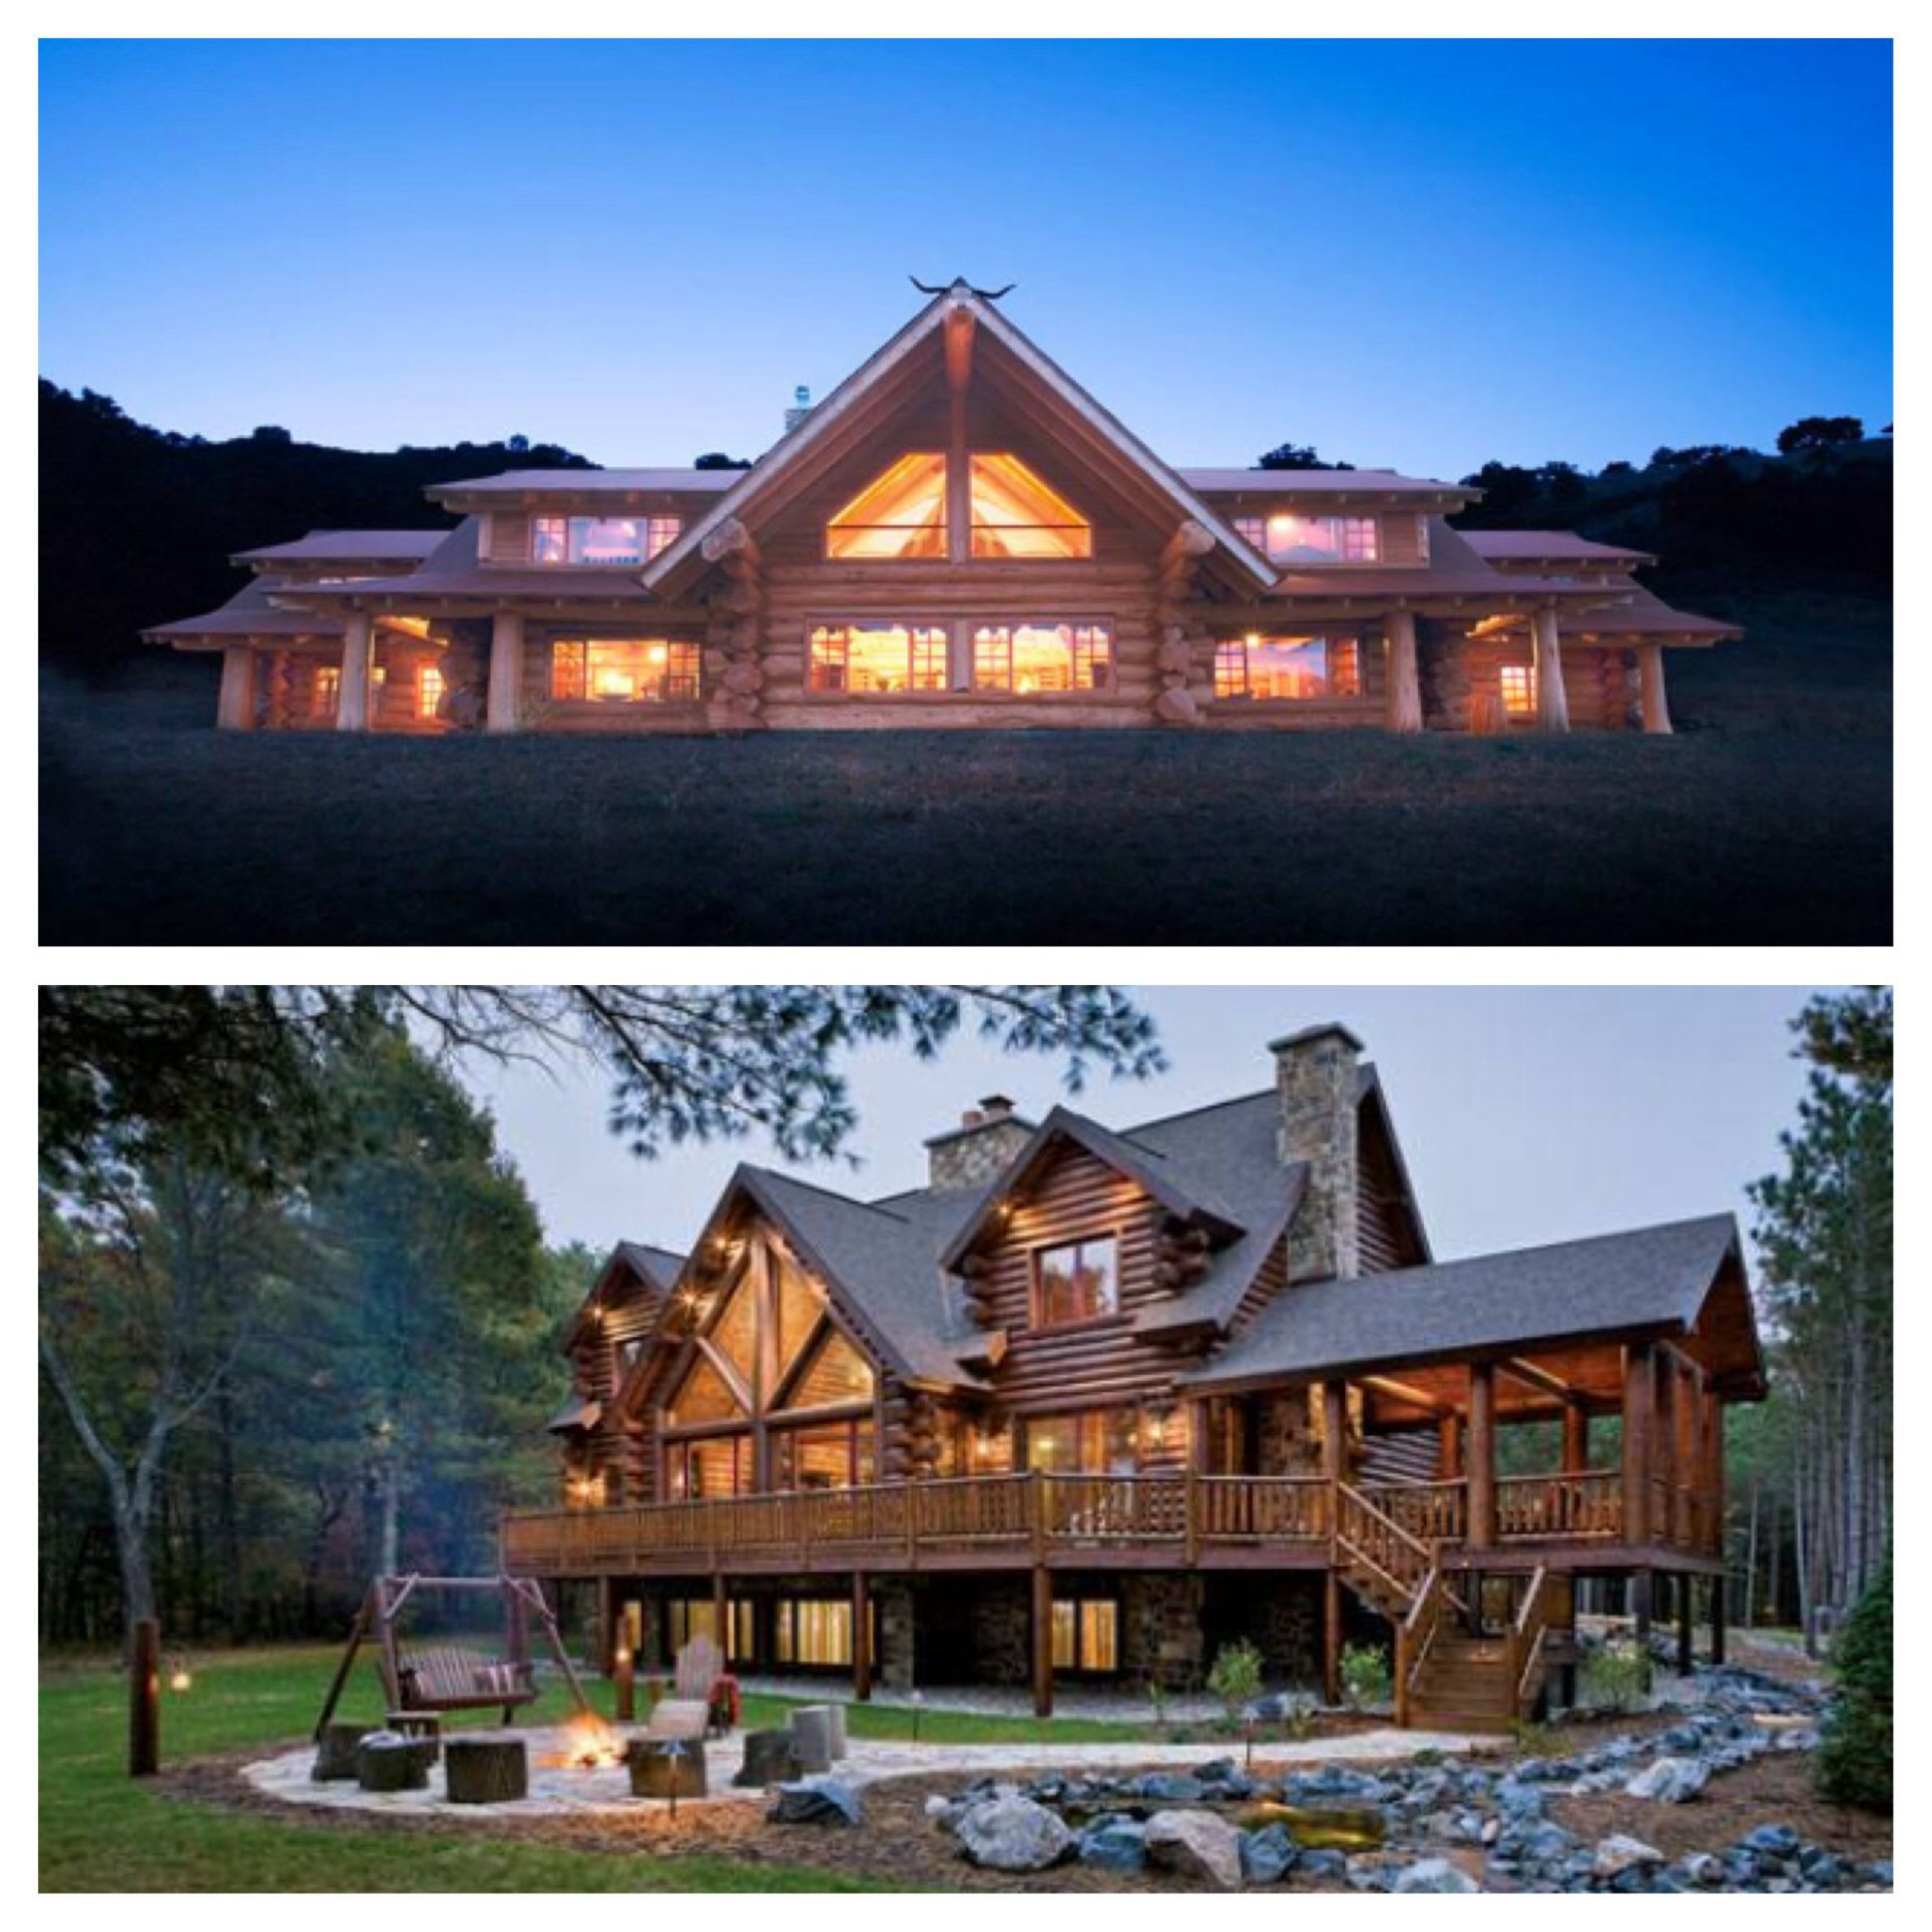 Some beautiful dream log cabin homes! | Log cabin homes ...